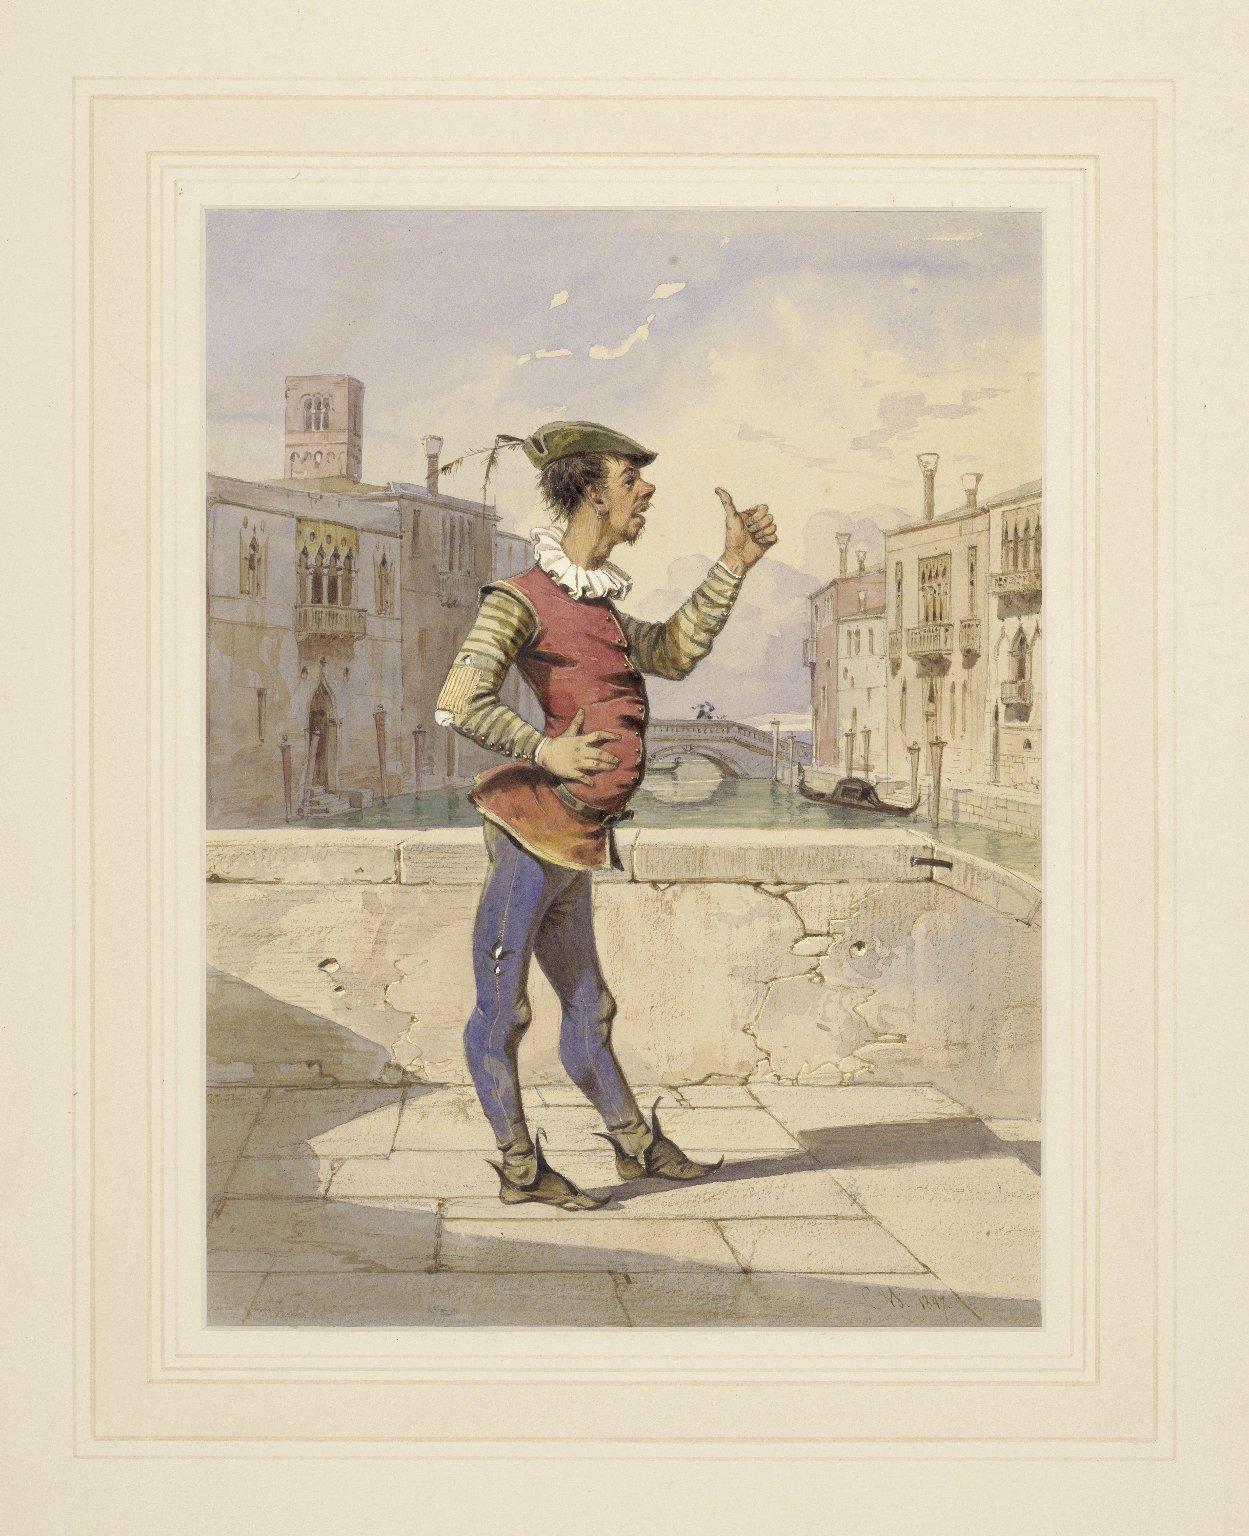 [Merchant of Venice, act 2, scene 2, Launcelot Gobbo, the clown] [graphic] / C.W., 1847.